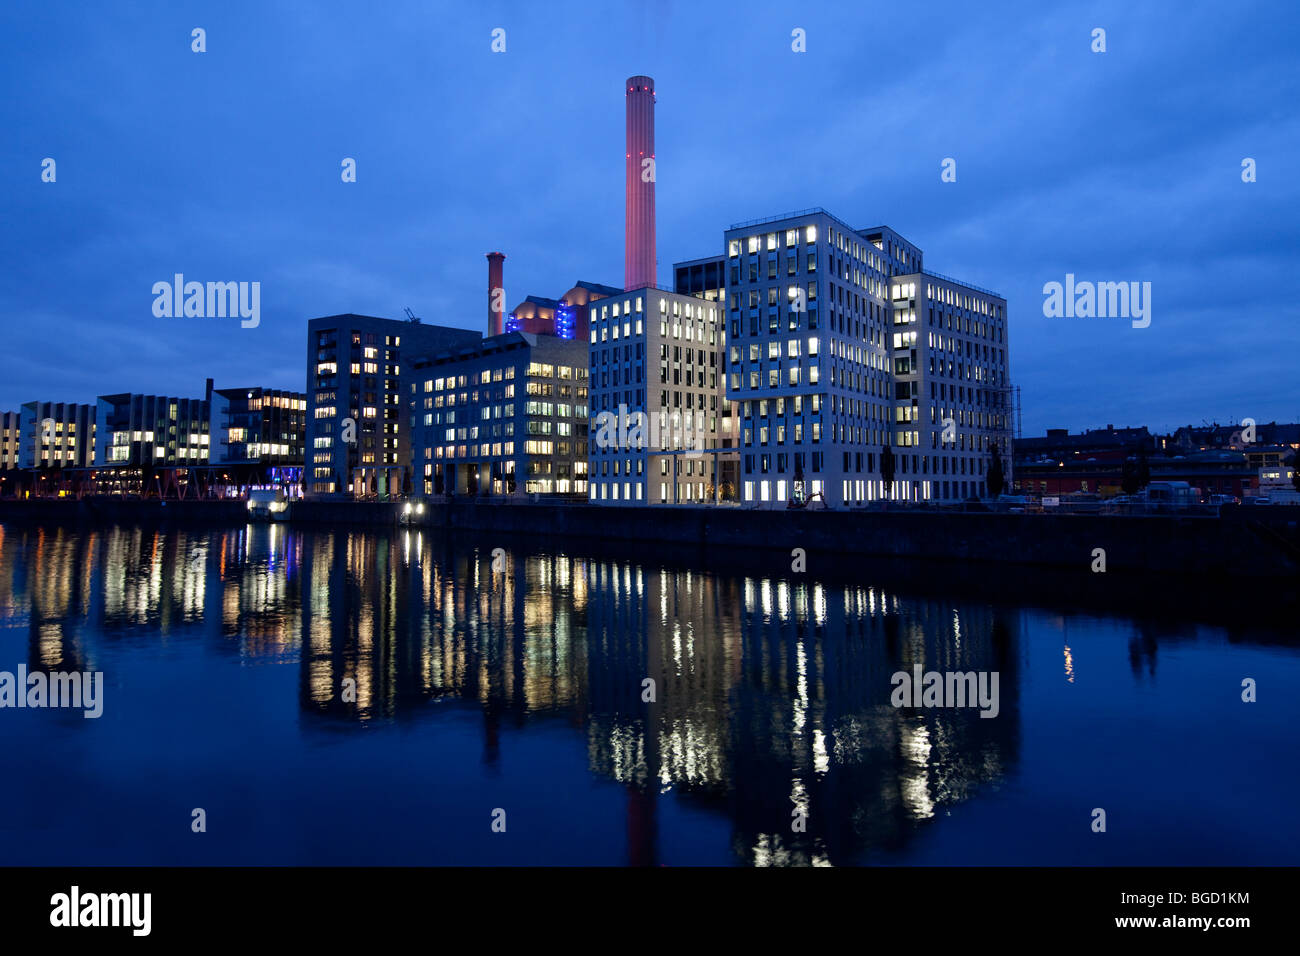 Industrial building, heating plant in the Westhafen harbor, Frankfurt am Main, Hesse, Germany, Europe - Stock Image